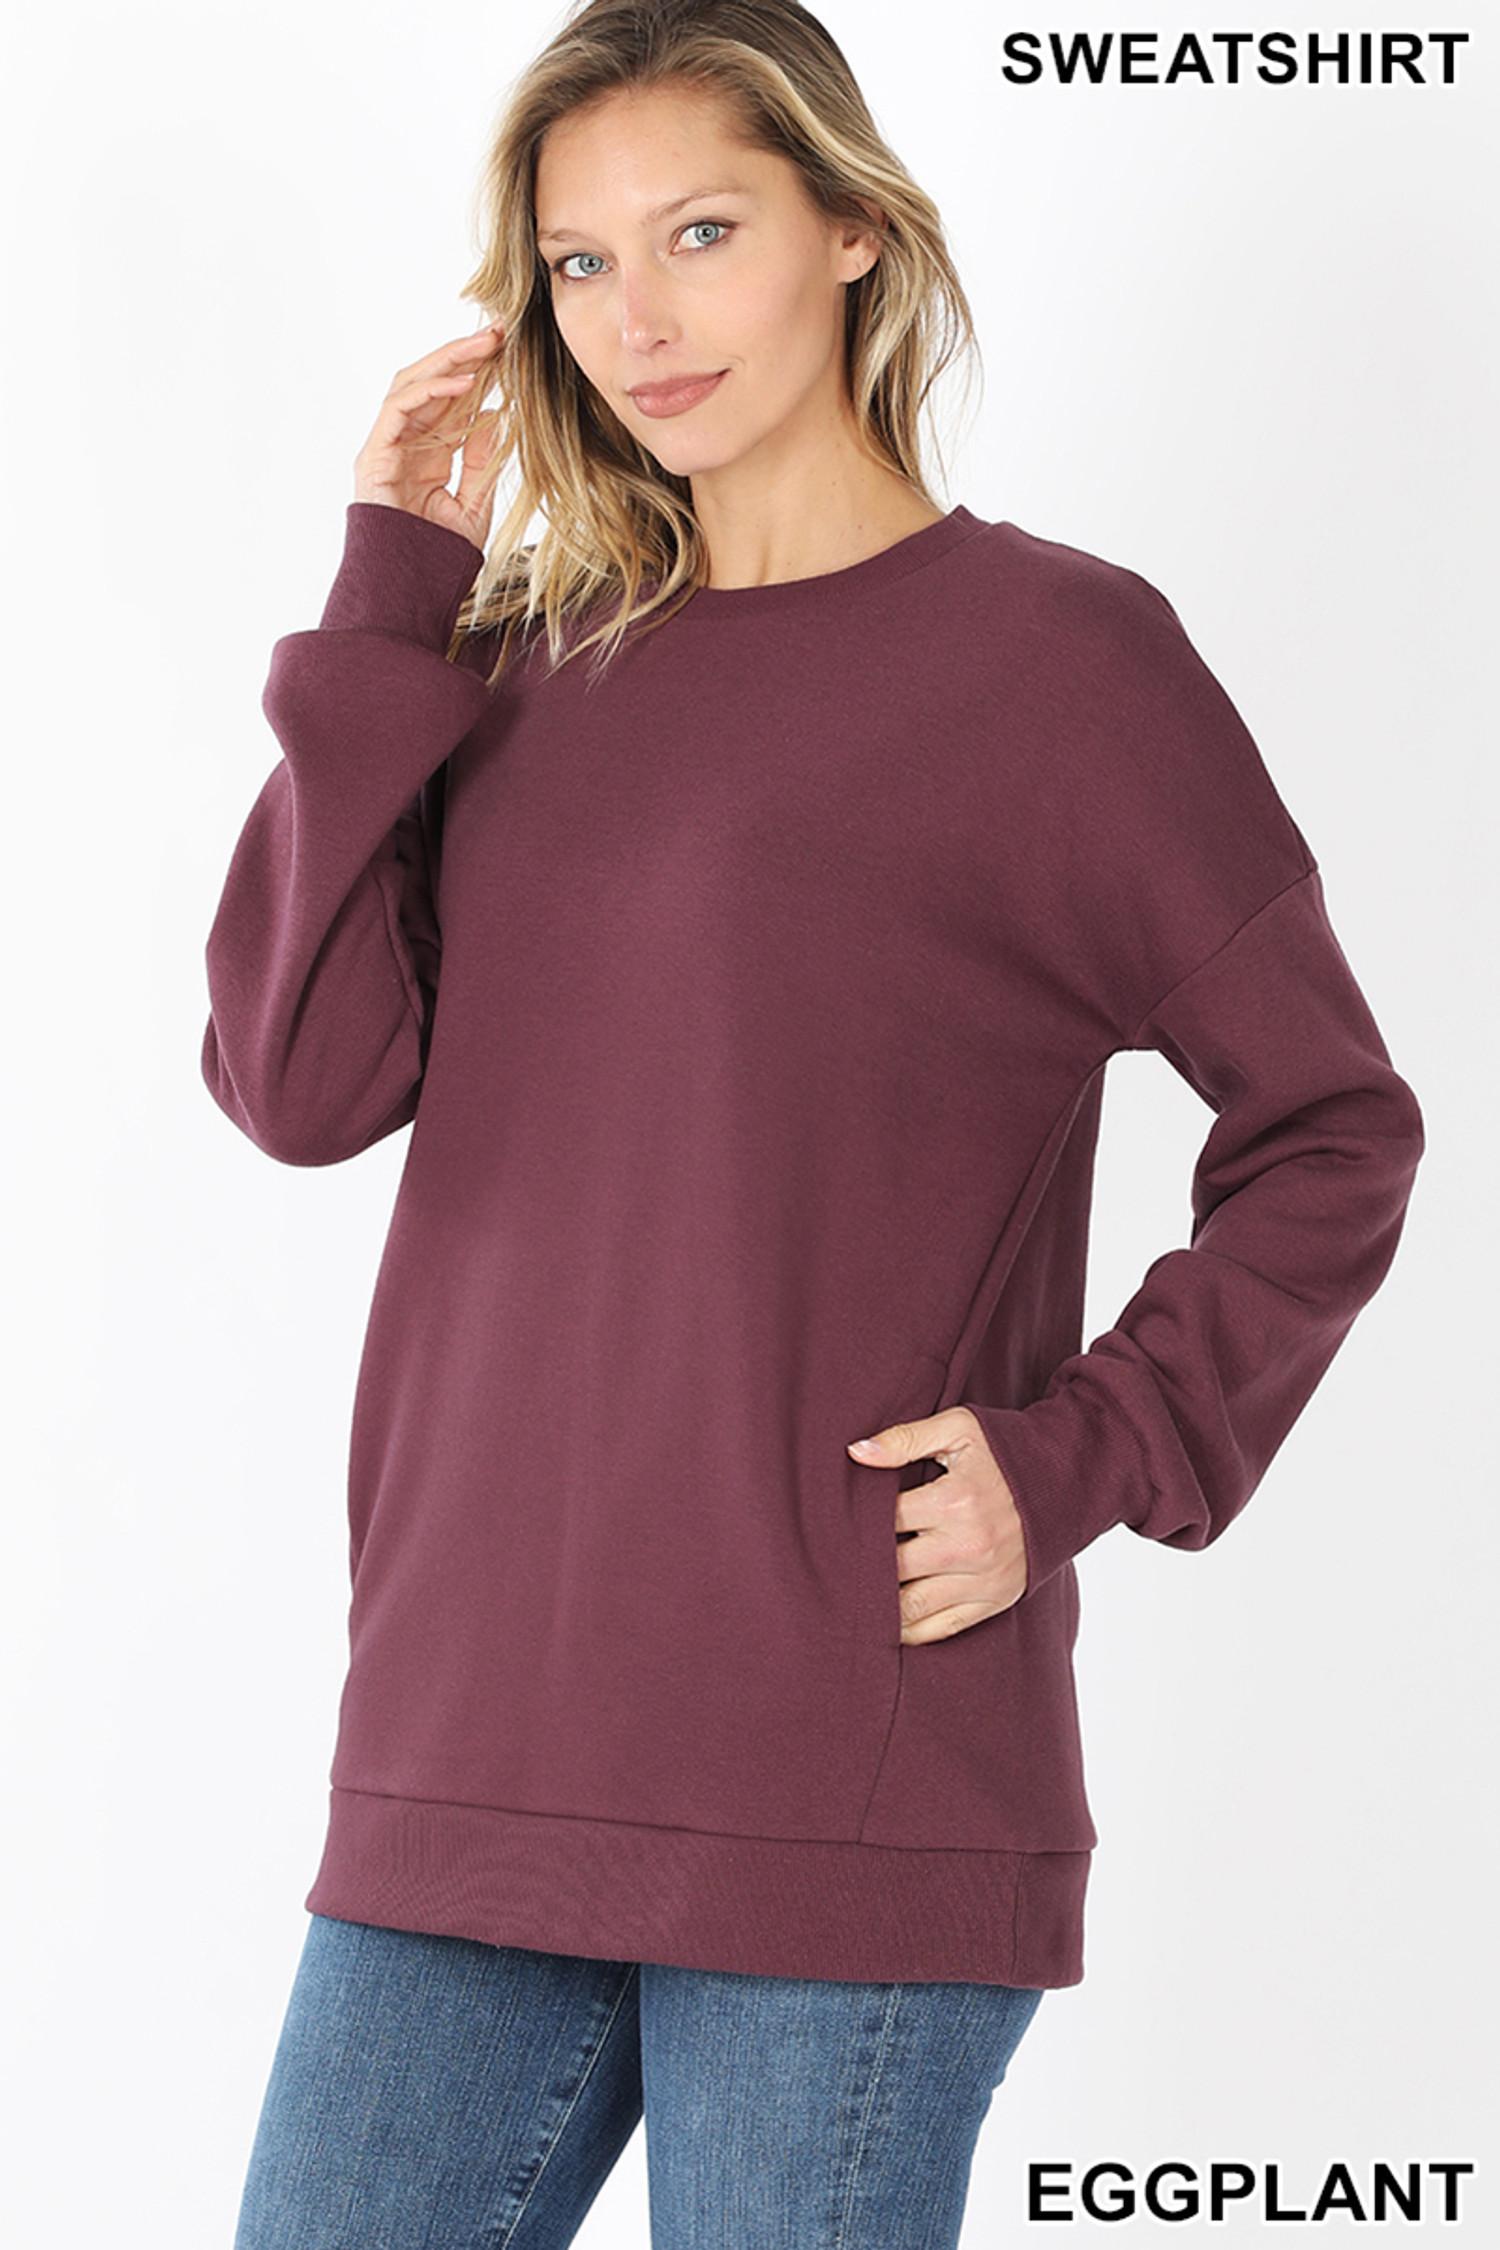 Slightly turned image of Eggplant Round Crew Neck Sweatshirt with Side Pockets